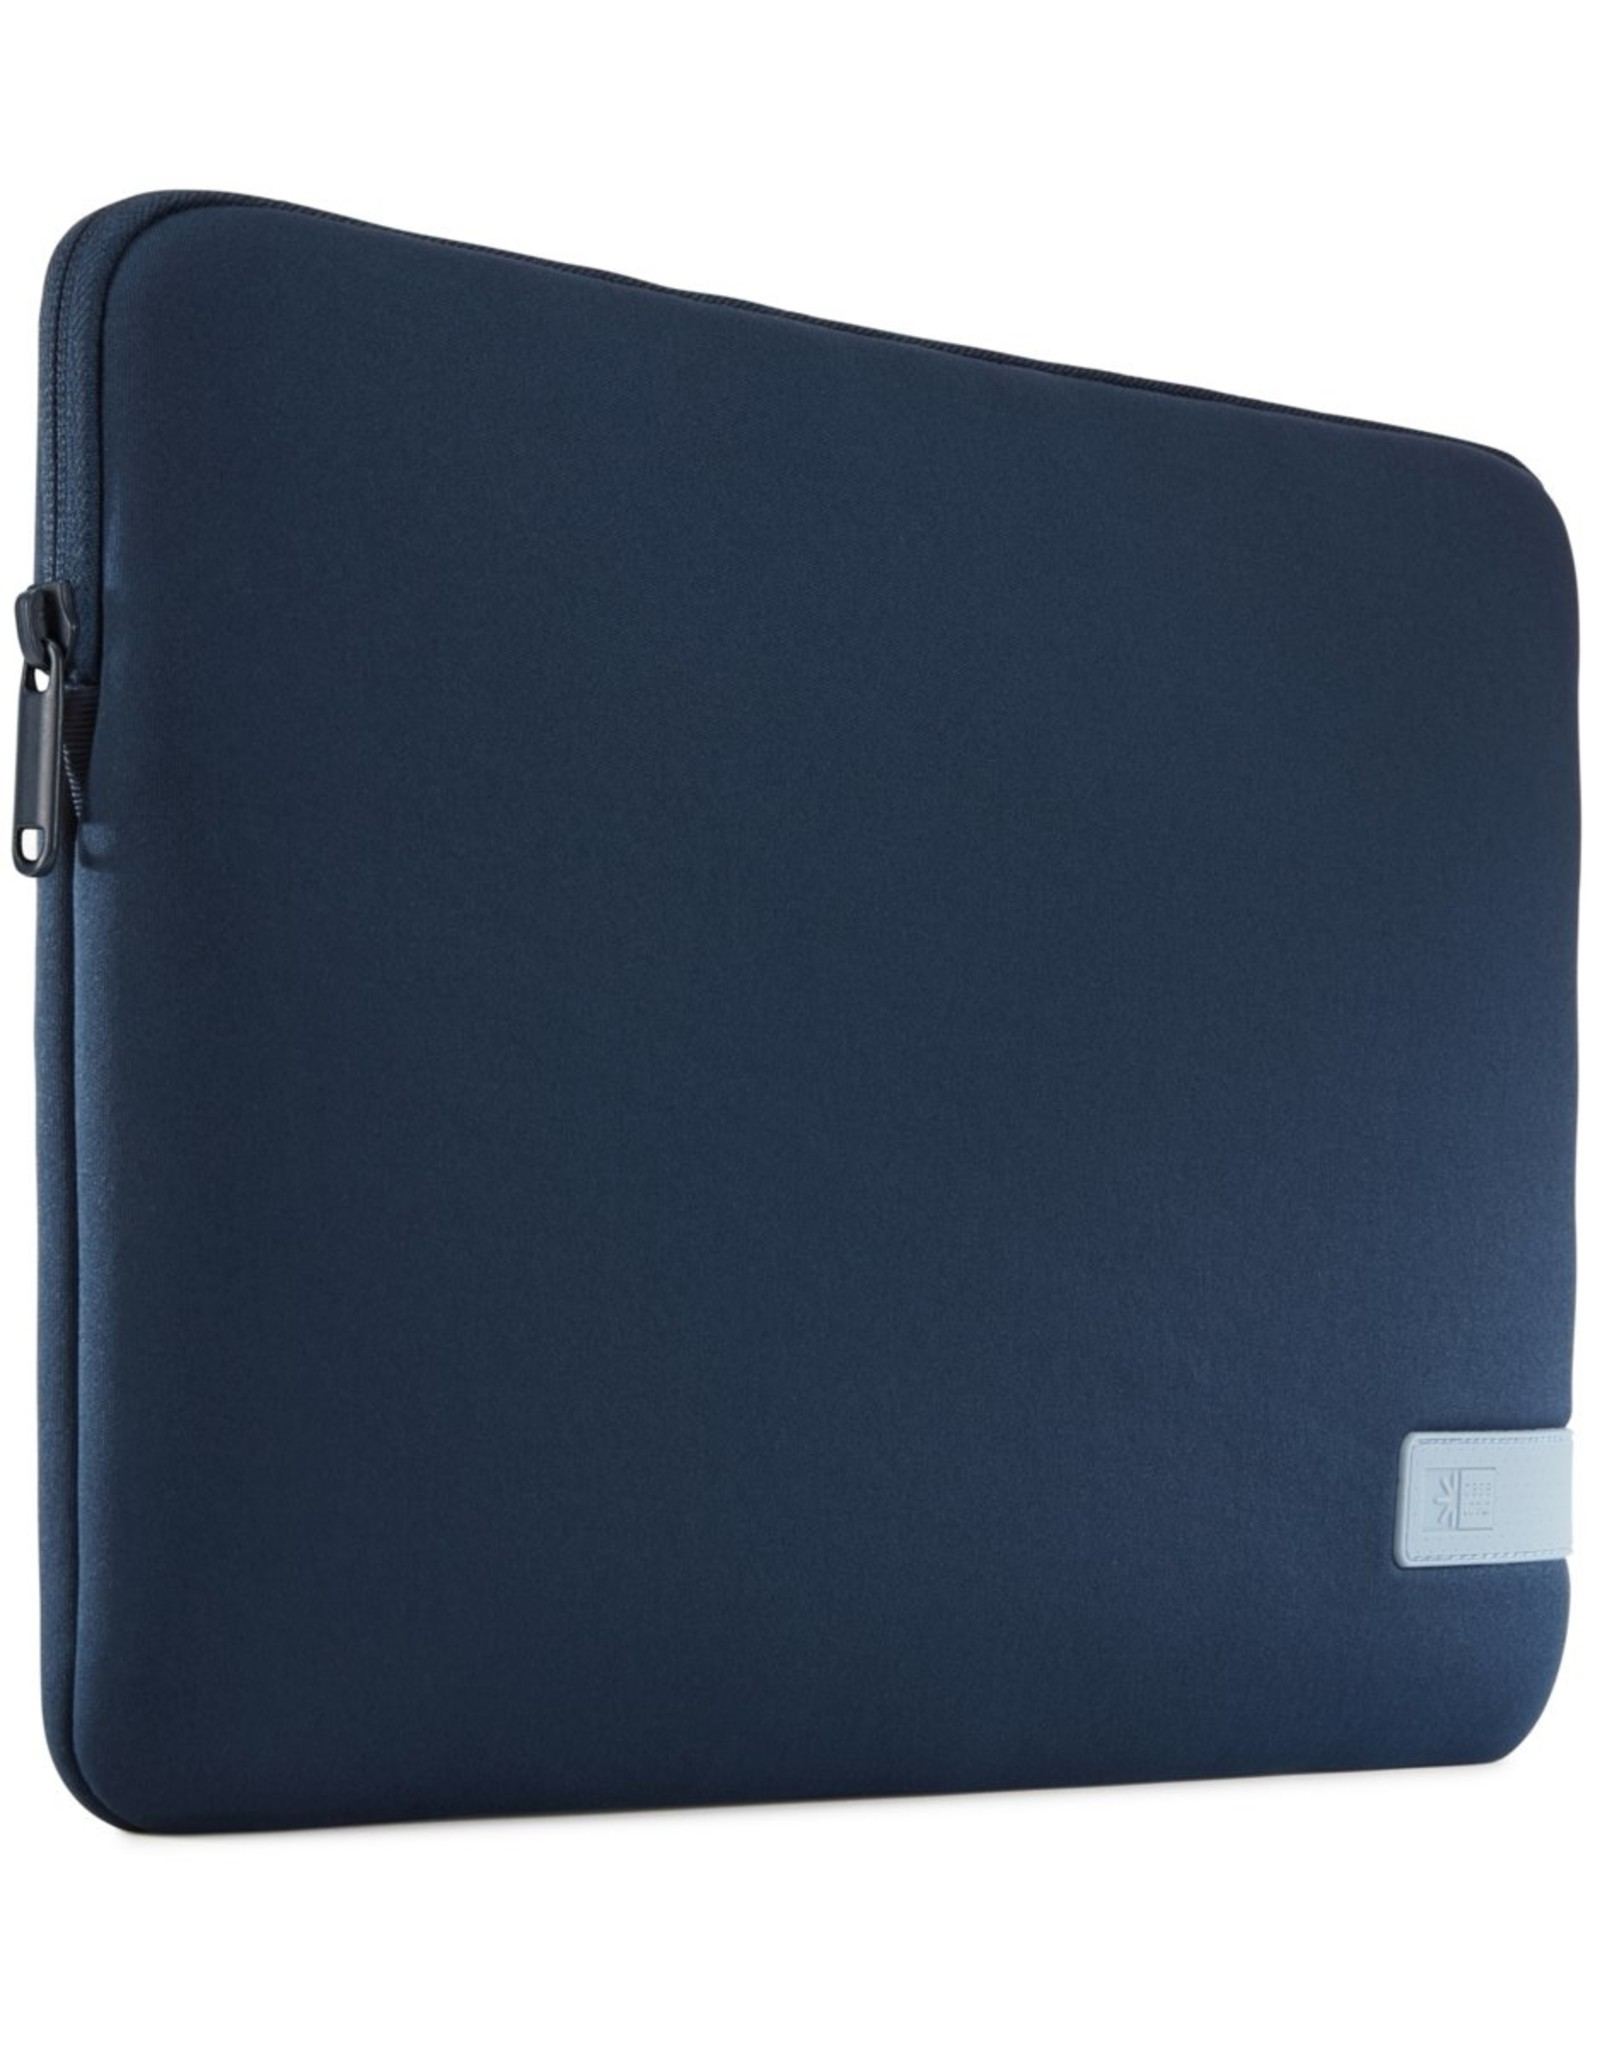 OEM Caselogic Reflect 14inch Dark Blue Laptop Sleeve